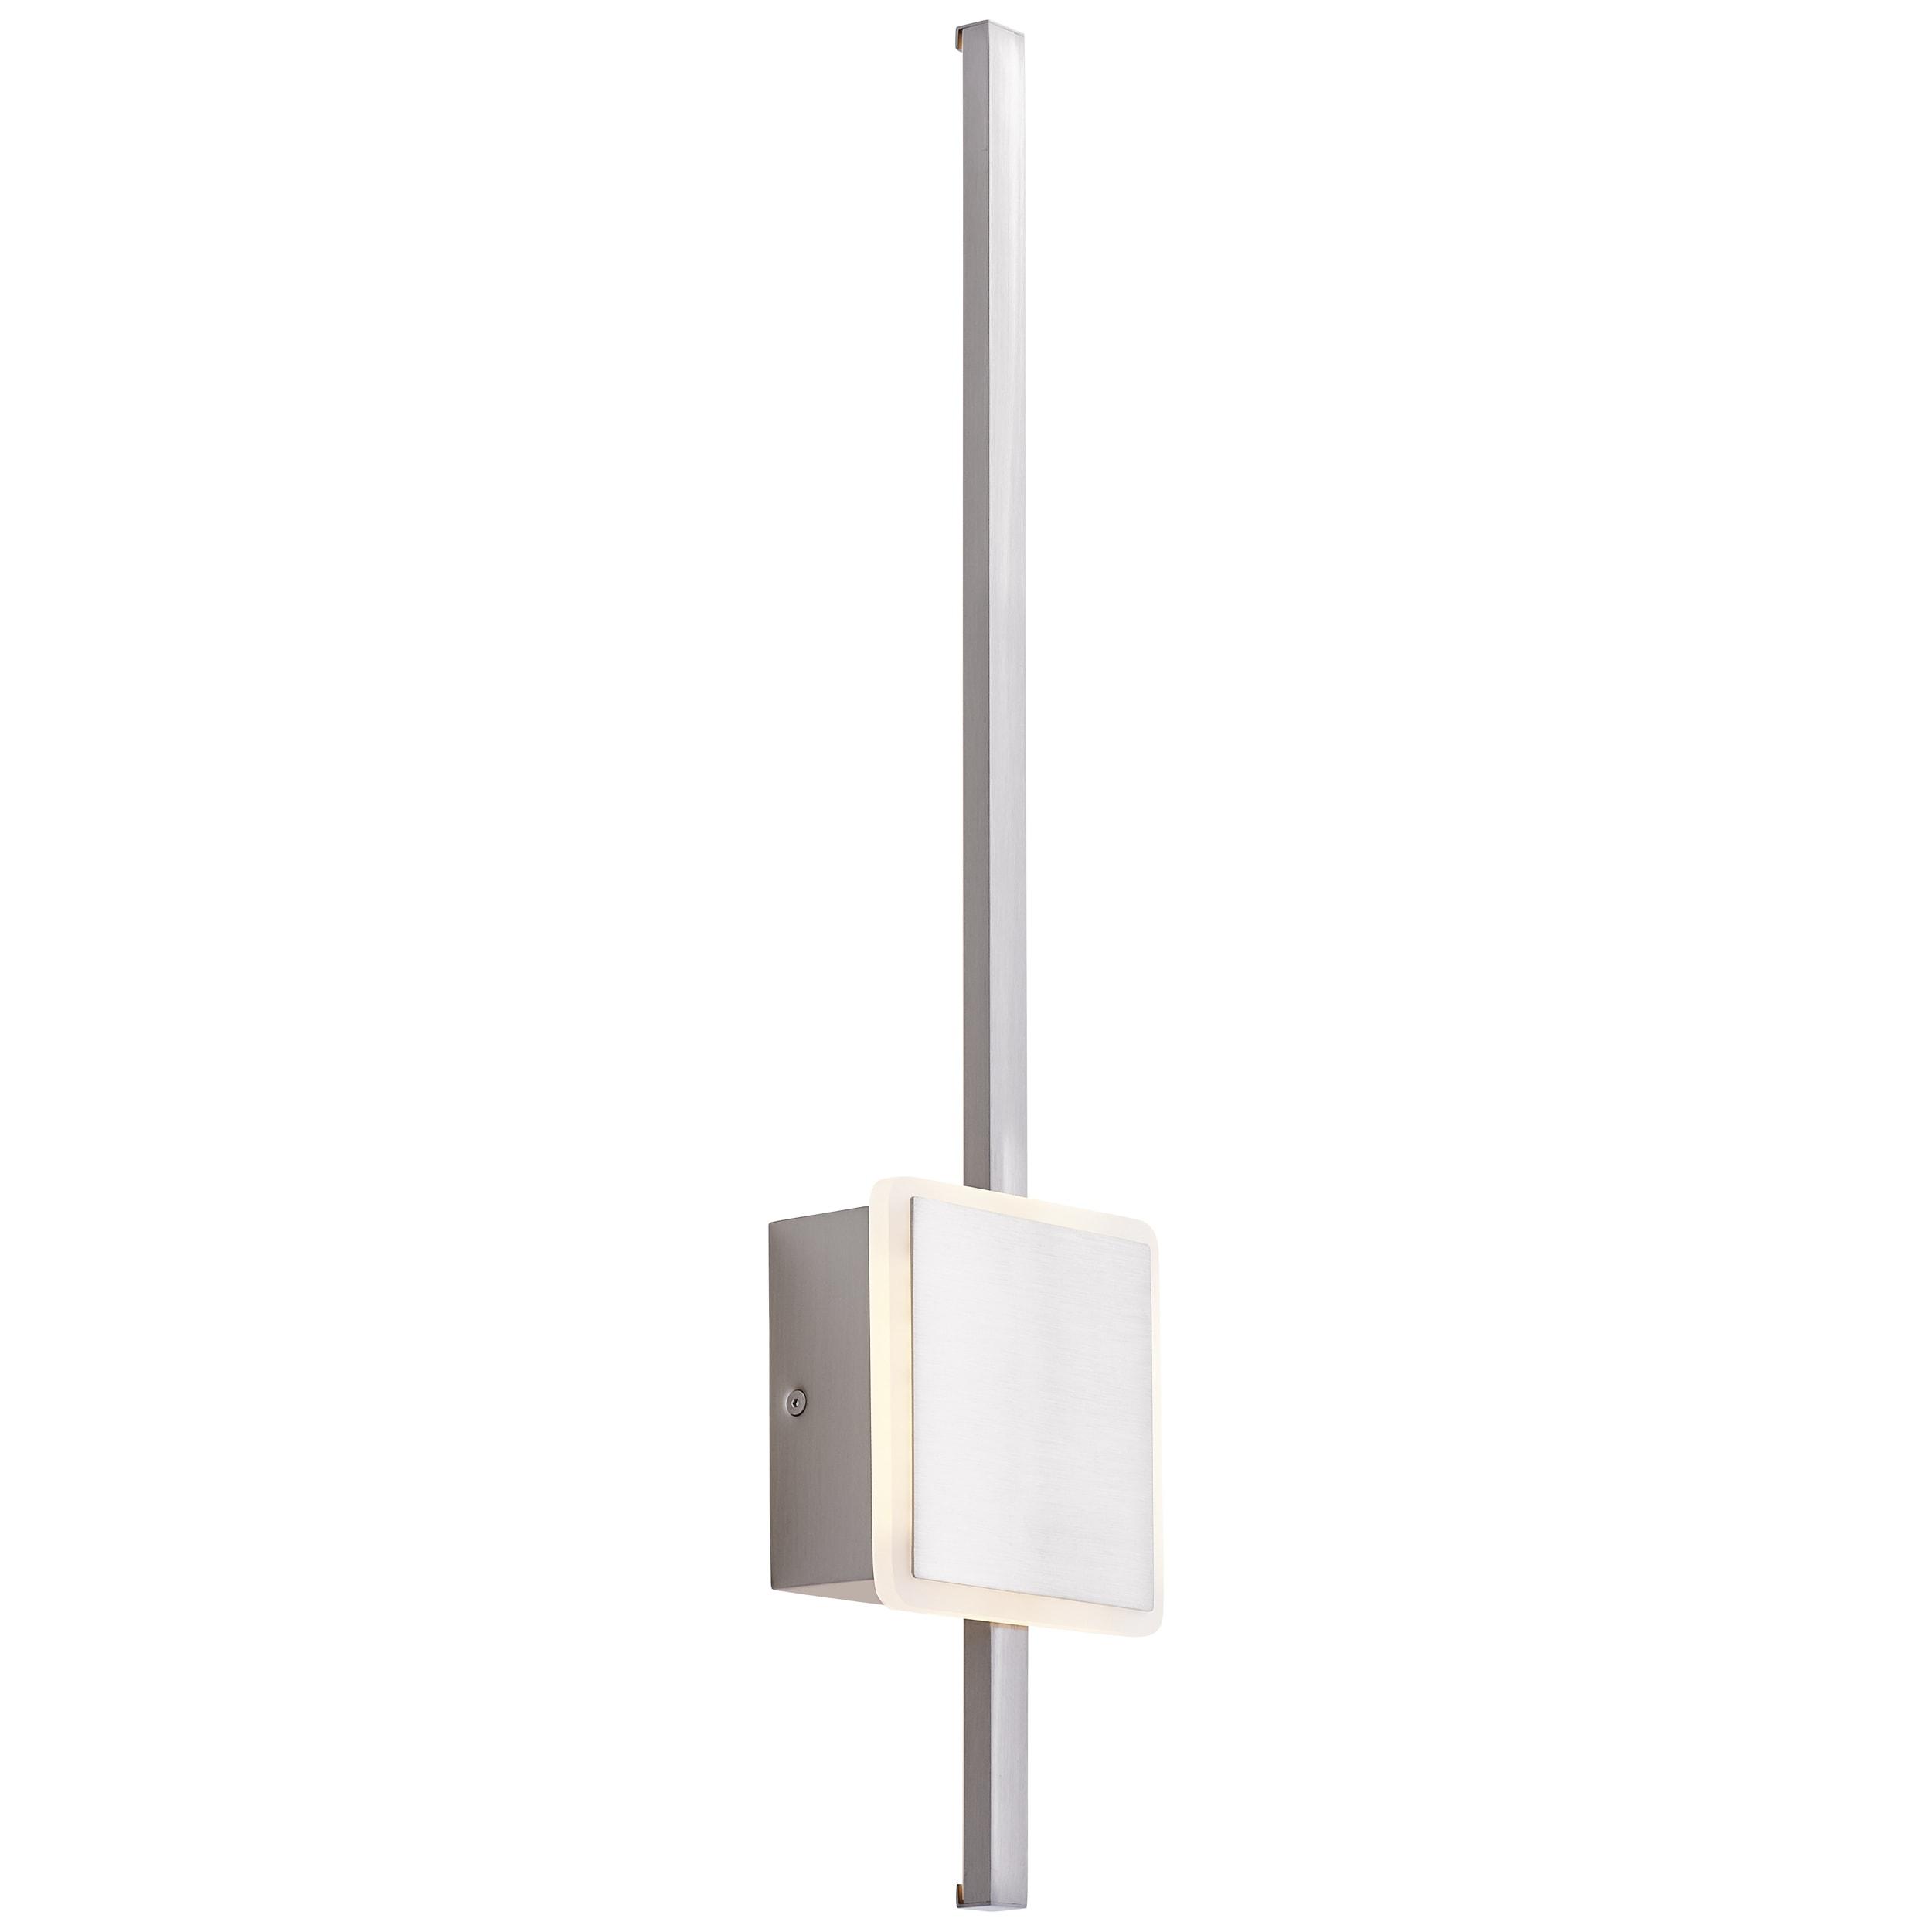 AEG Inessa LED Wandleuchte 62cm pearl nickel